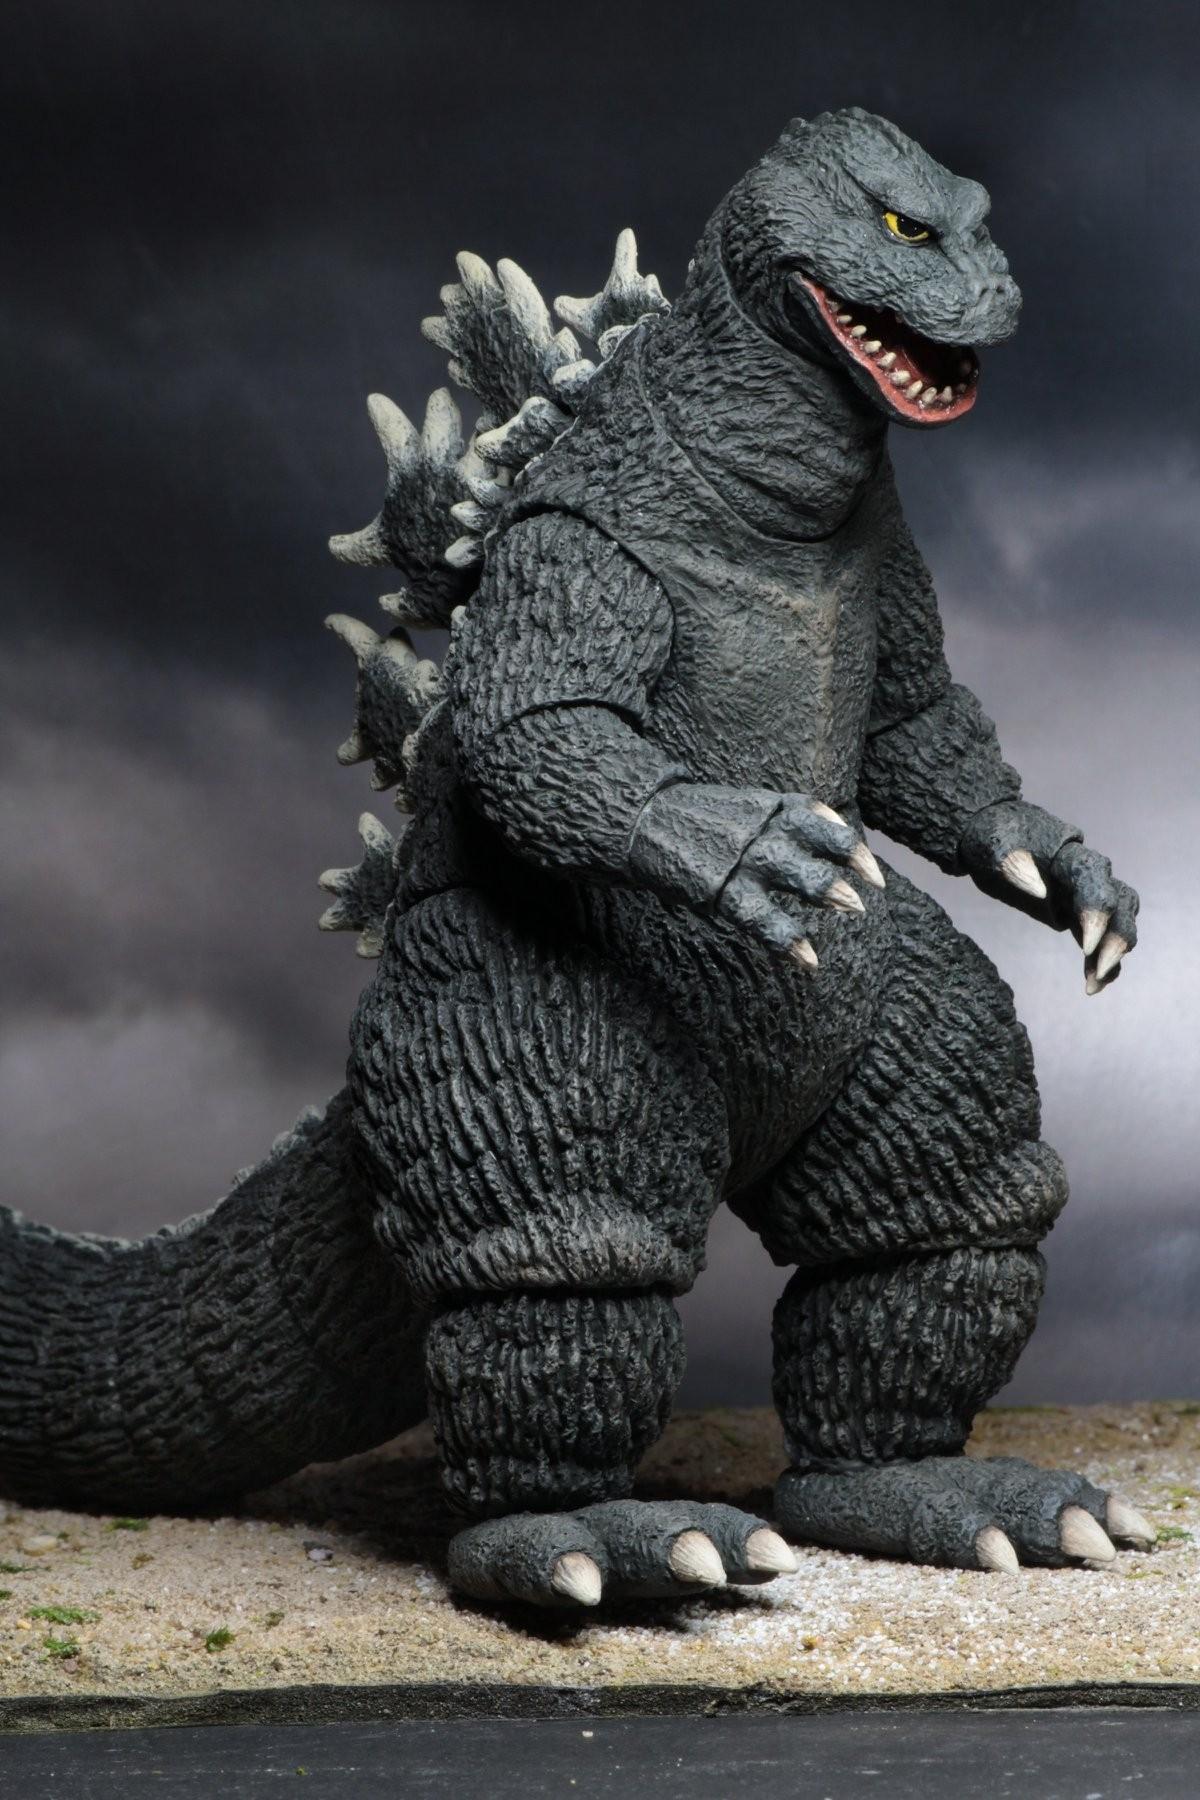 12/″ Head to Tail Action Figure Godzilla King Kong vs. Godzilla 1962 Movie NECA Godzilla